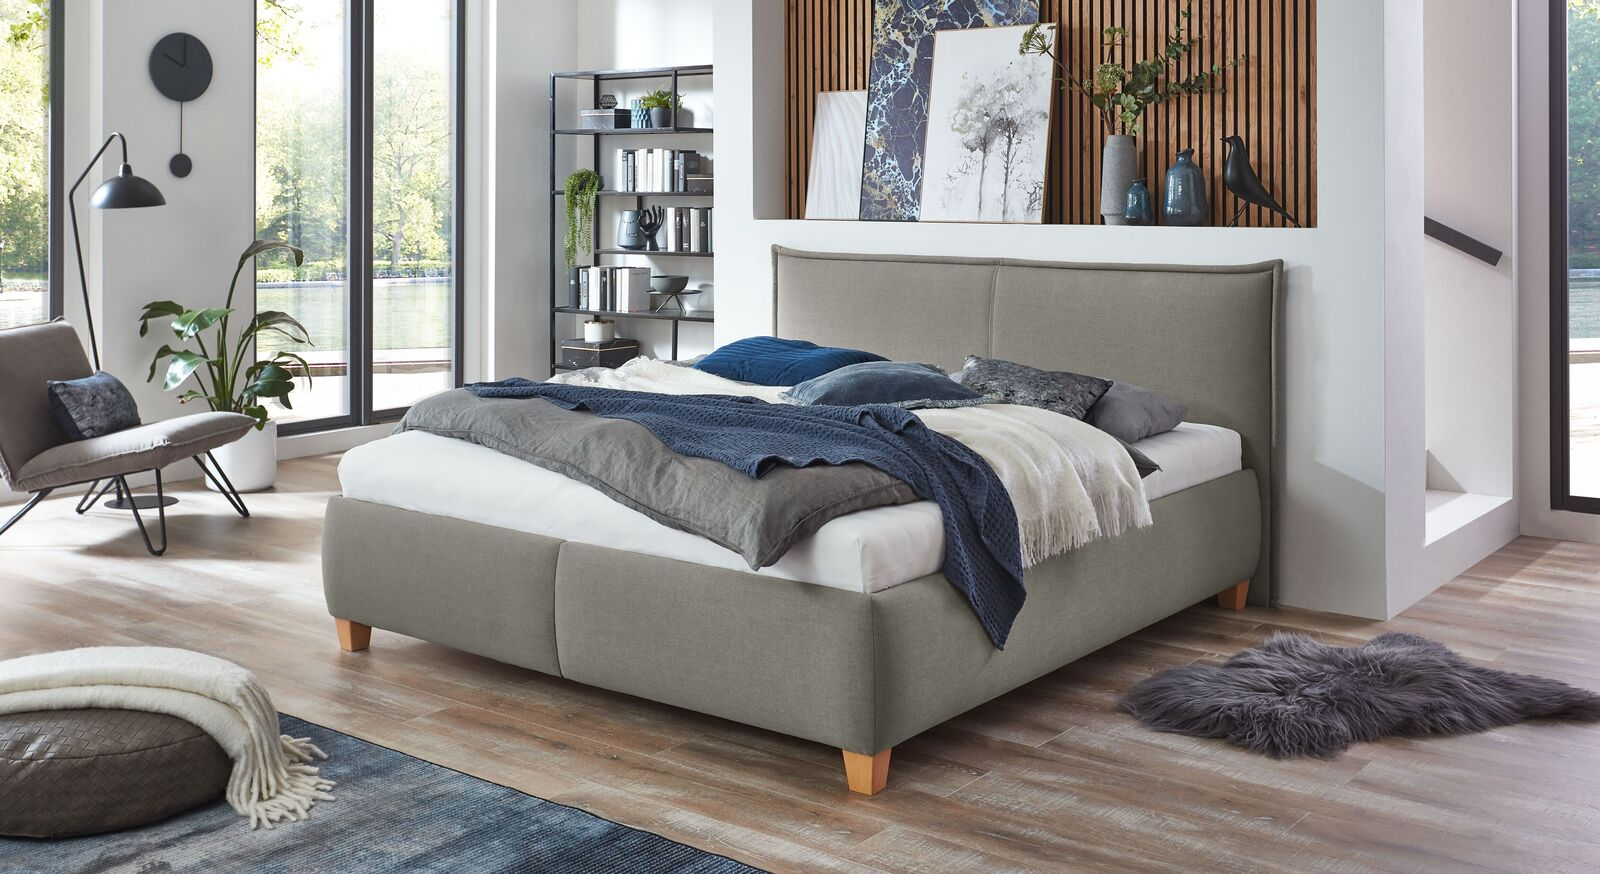 Bett Adana mit Webstoff in Grau